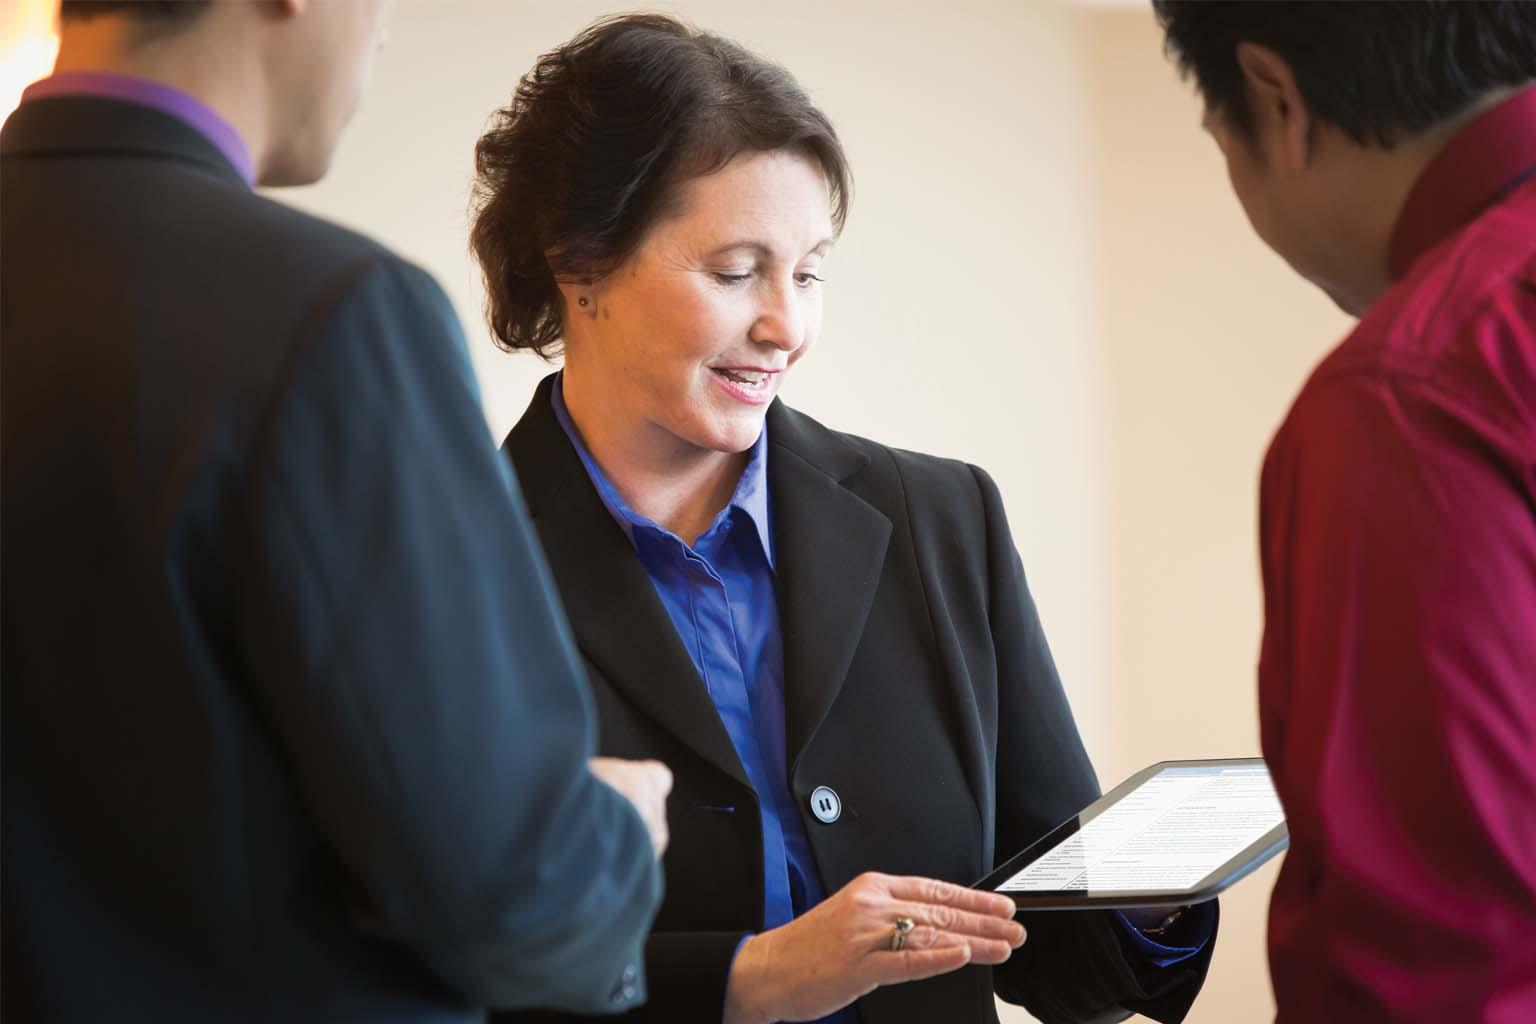 executives viewing tablet and talking